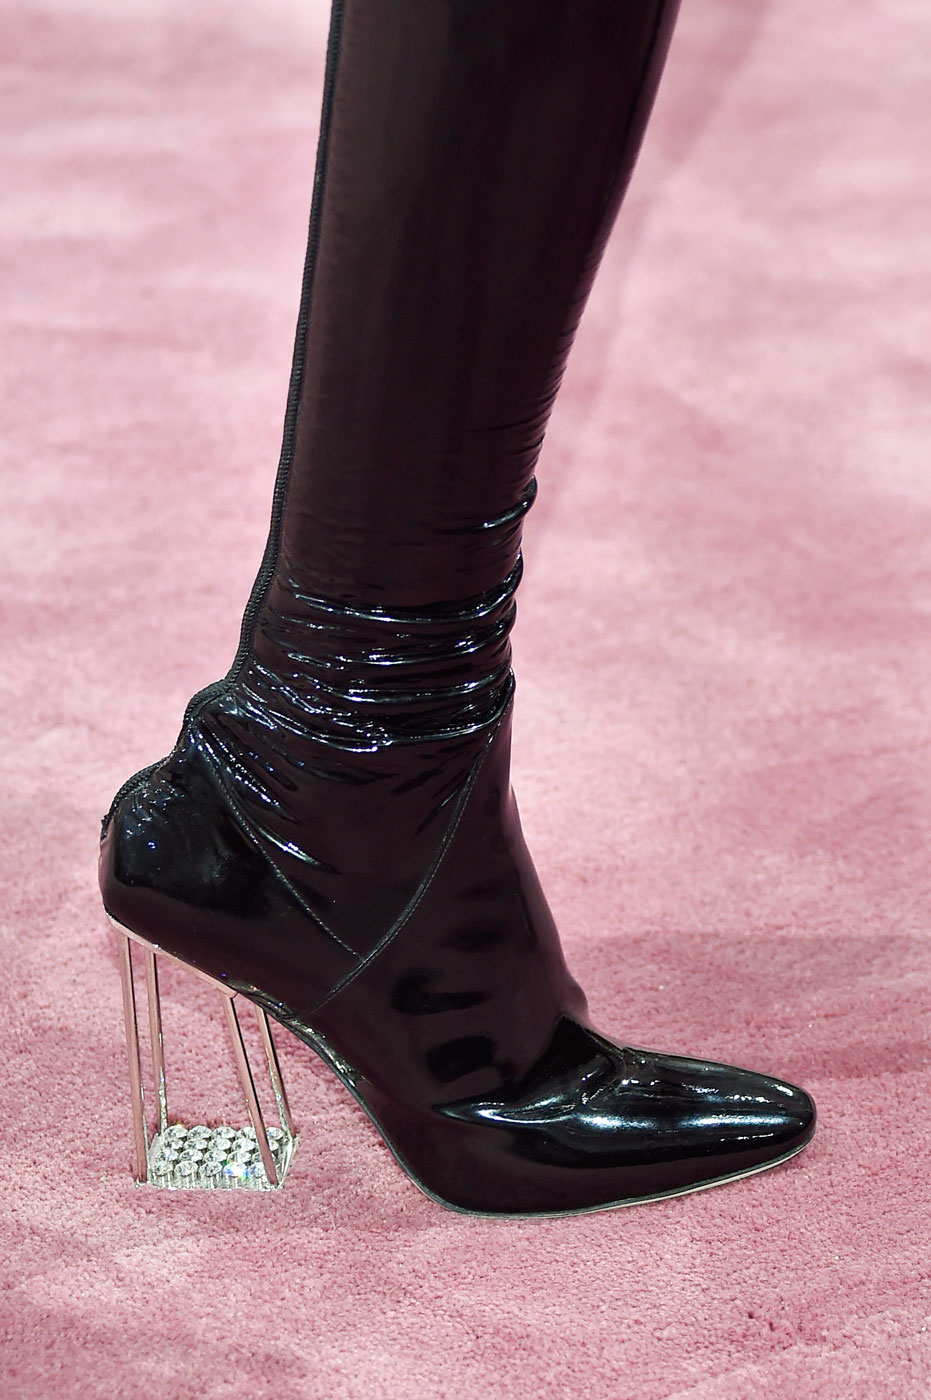 Christian-Dior-fashion-runway-show-close-ups-haute-couture-paris-spring-summer-2015-the-impression-095